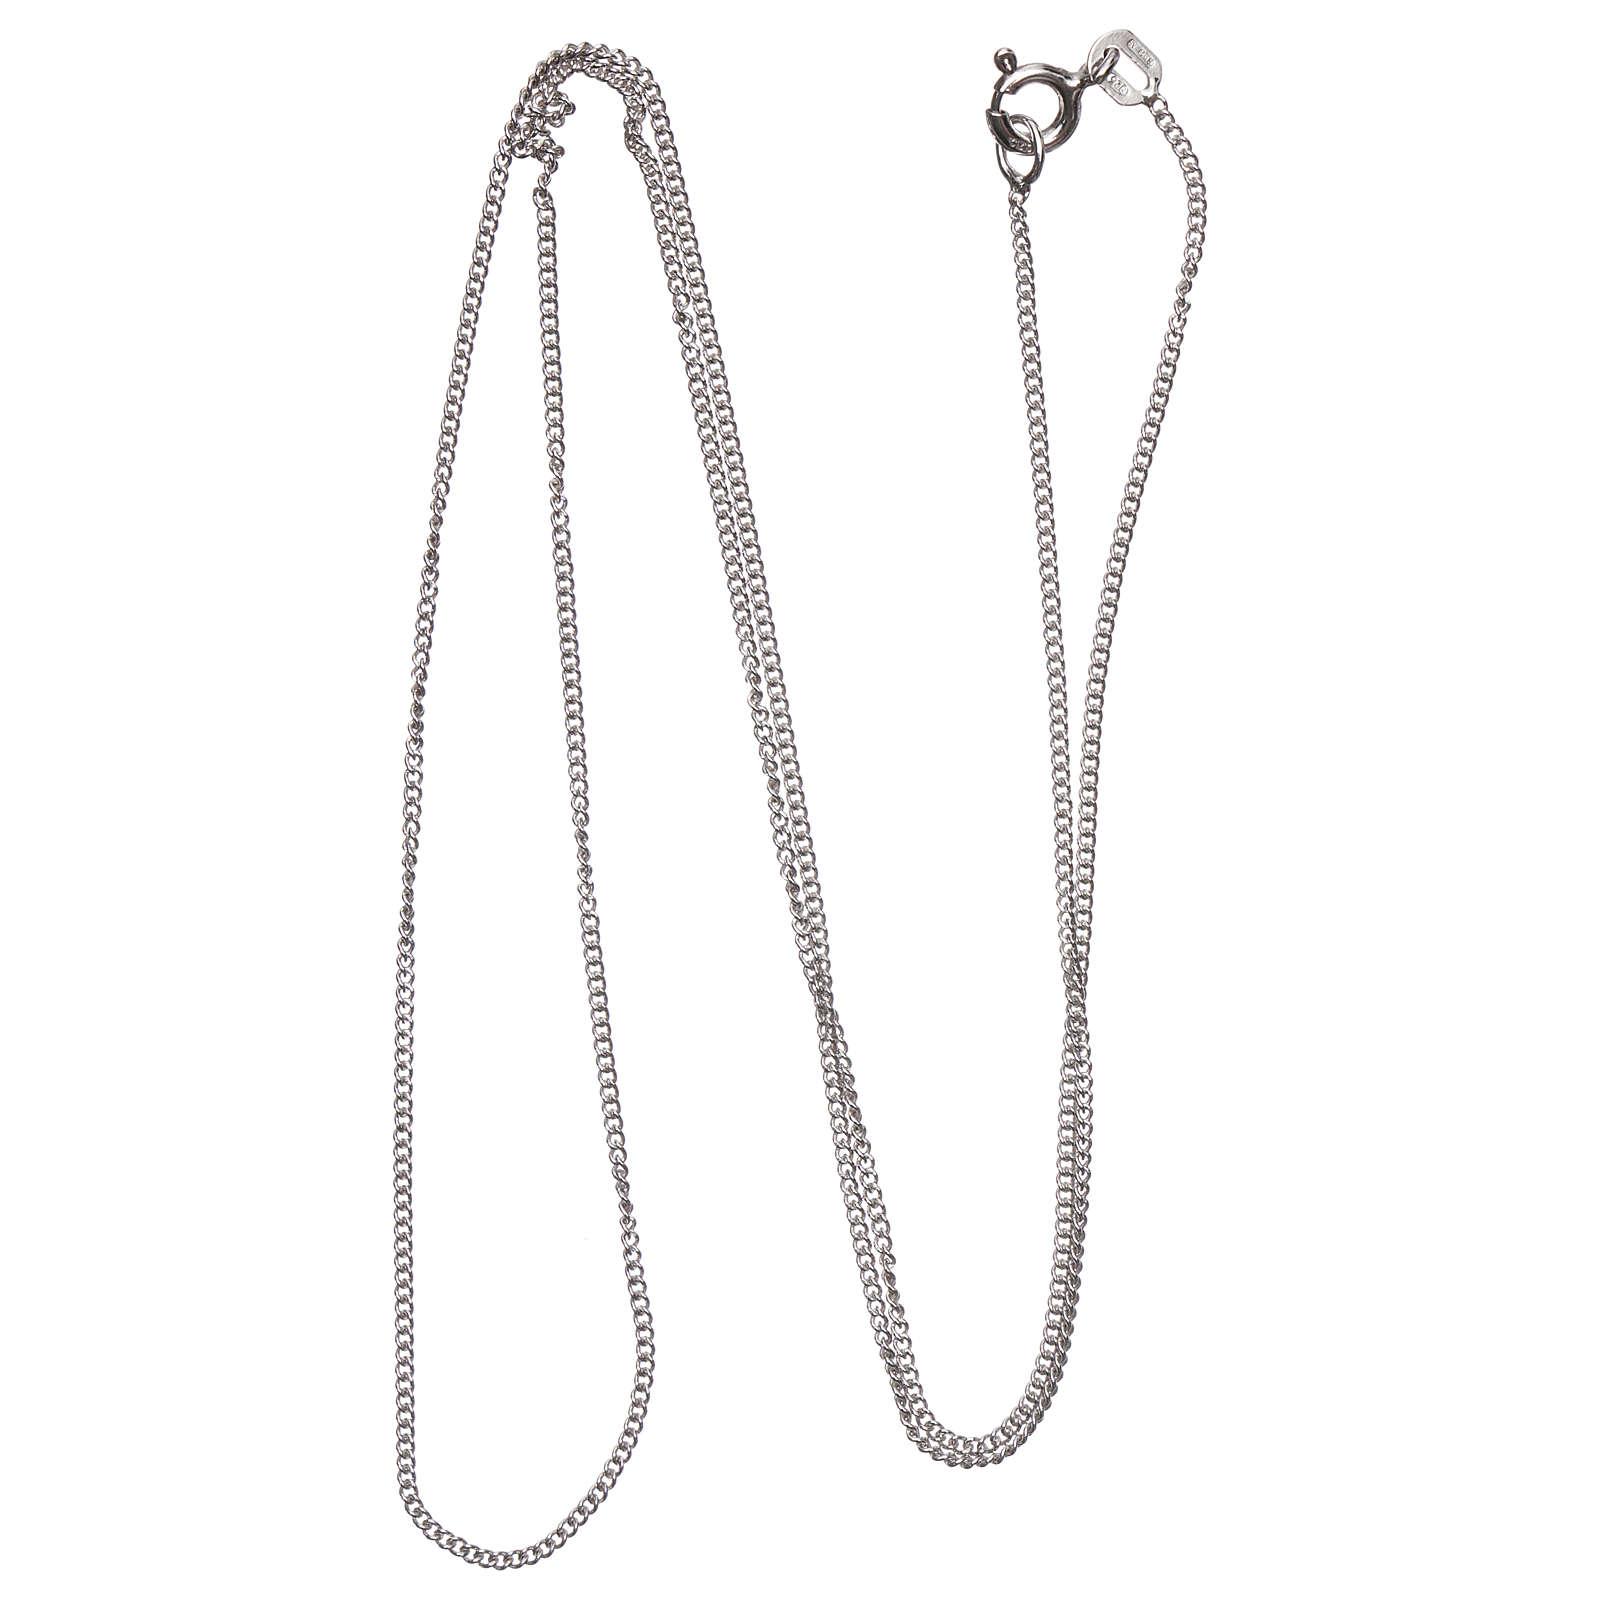 Corrente Groumett prata 925 radiada 50 cm comprimento 4